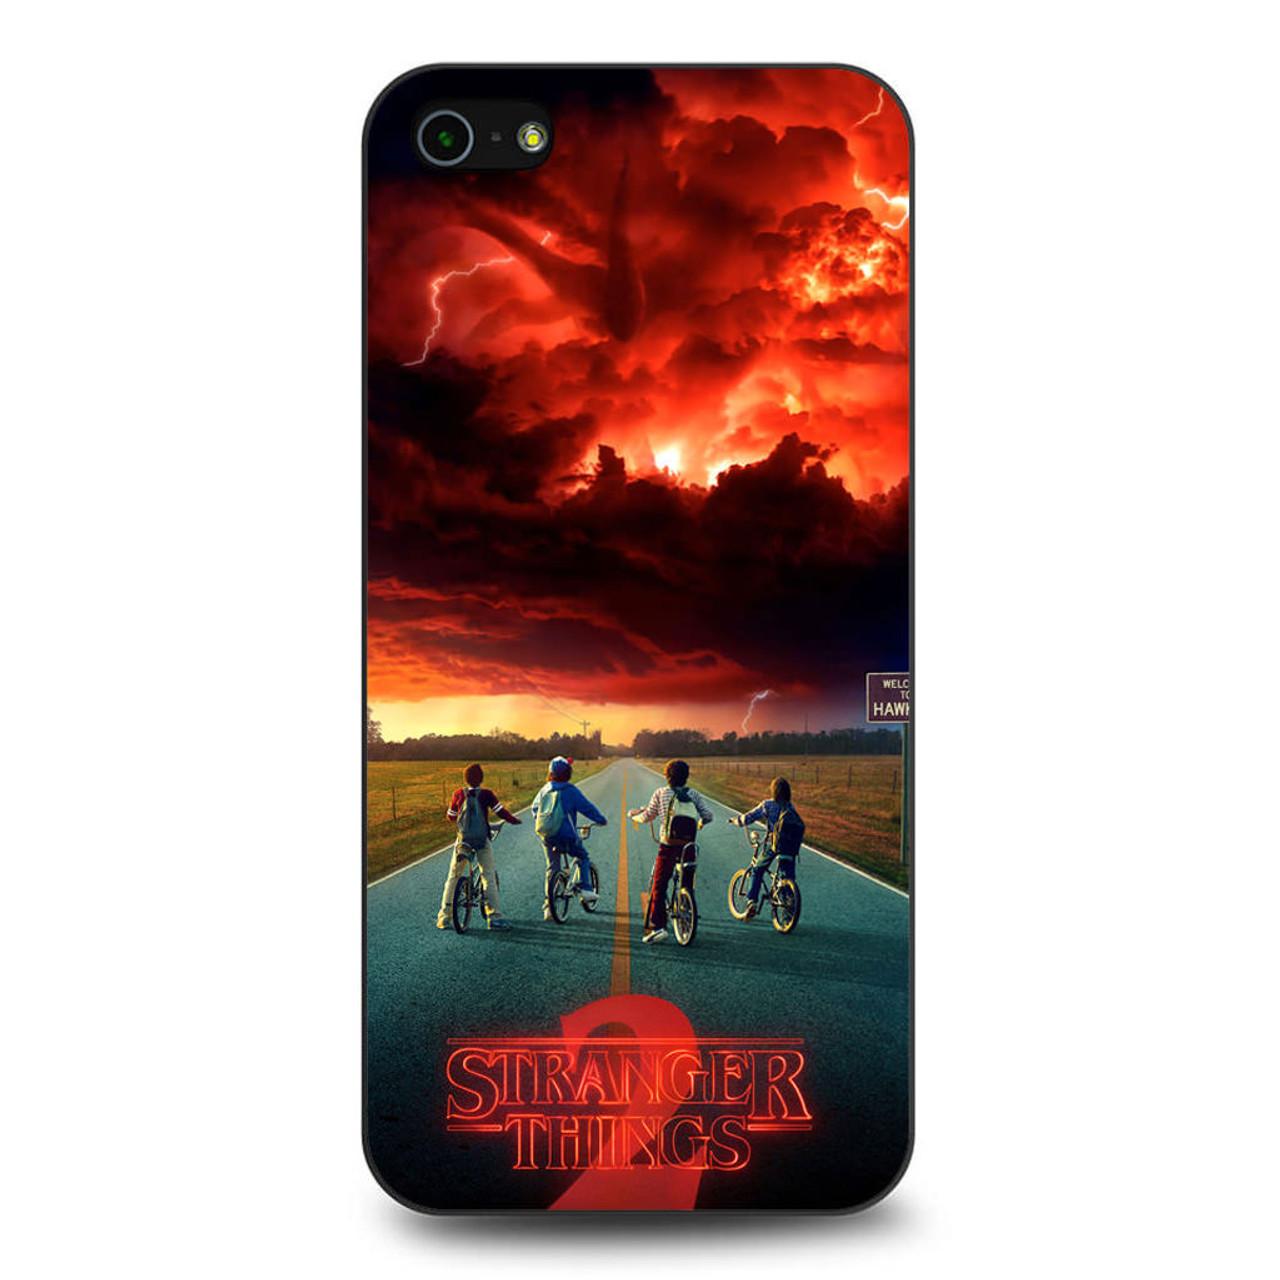 Stranger Things Season 2 iPhone 5/5S/SE Case